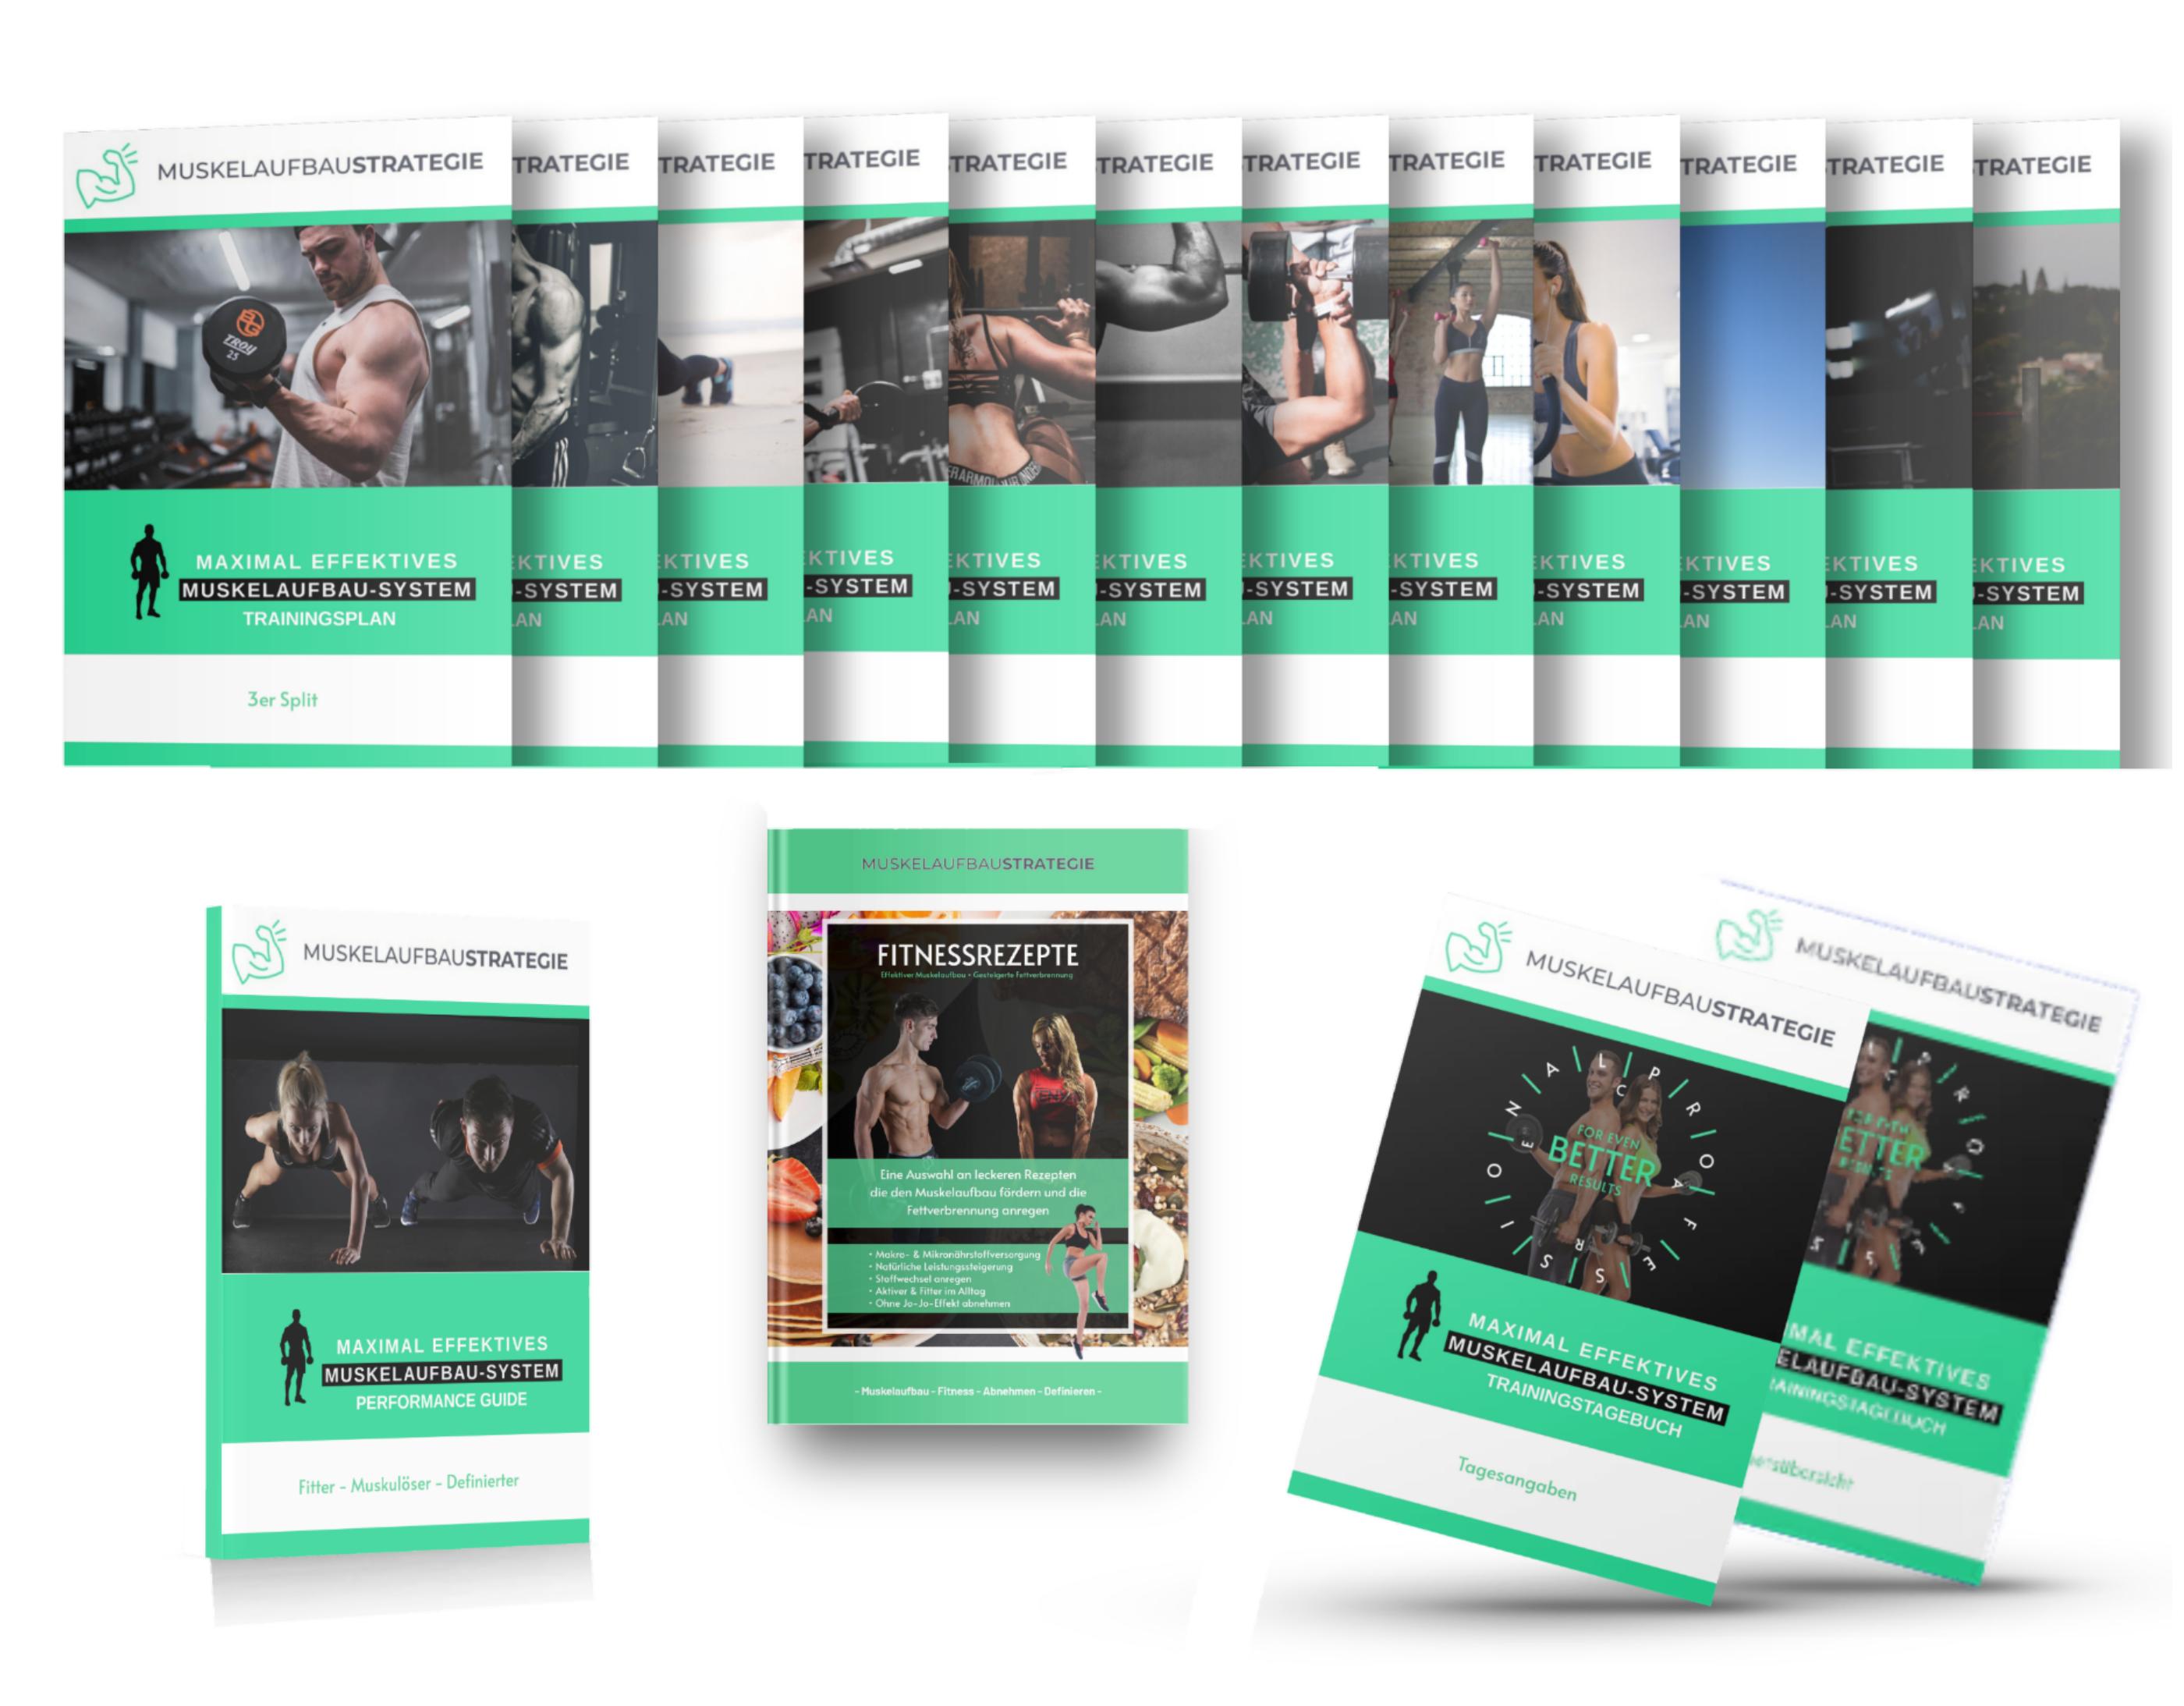 Fitnessprogramm, Fitness Trainingspläne, Fitnessrezepte, Fitness Buch